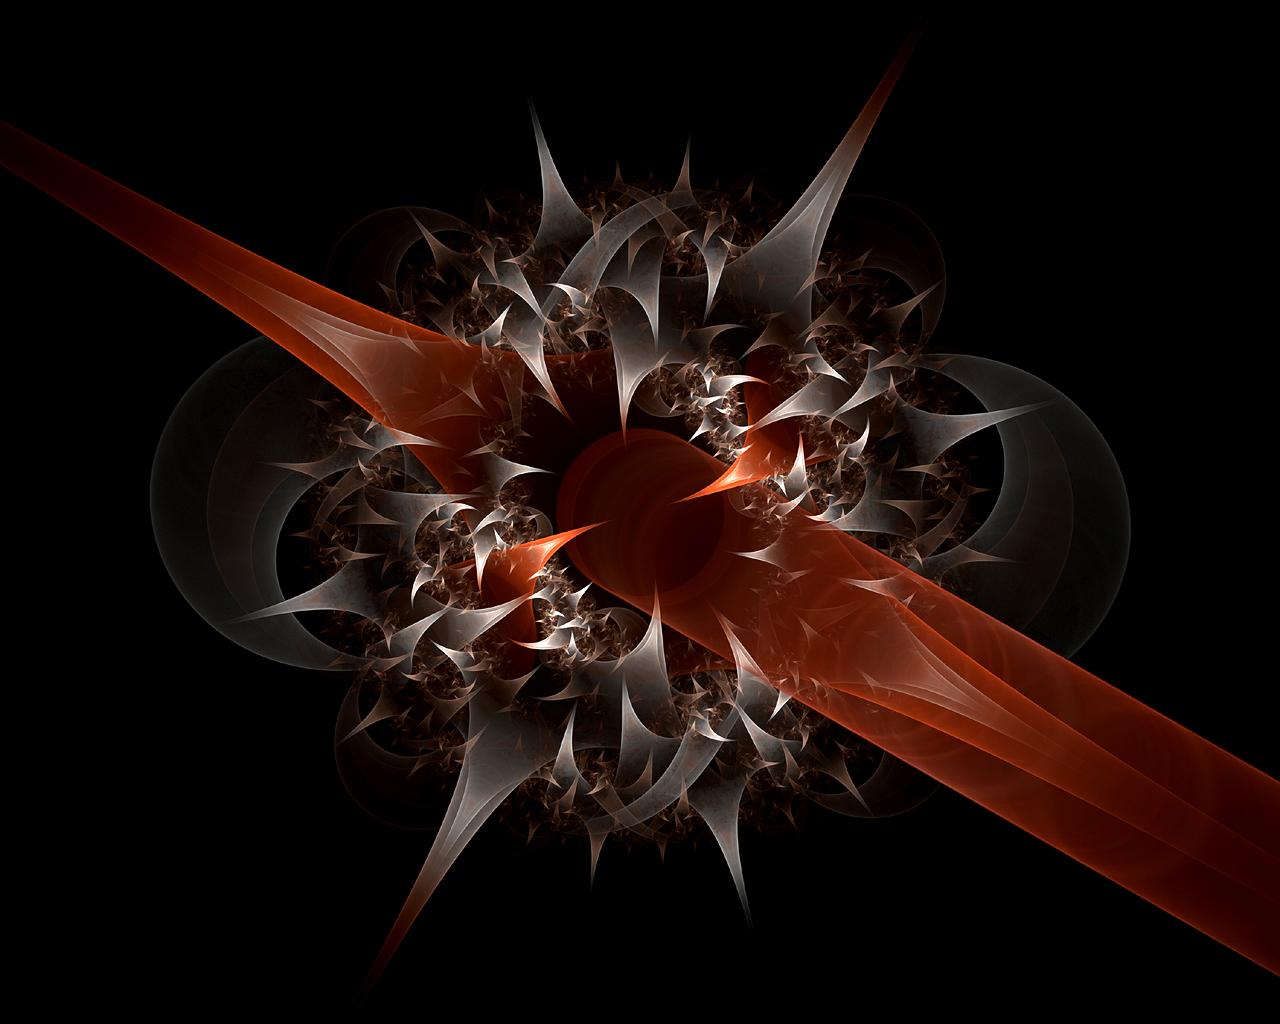 Impact by CygX1